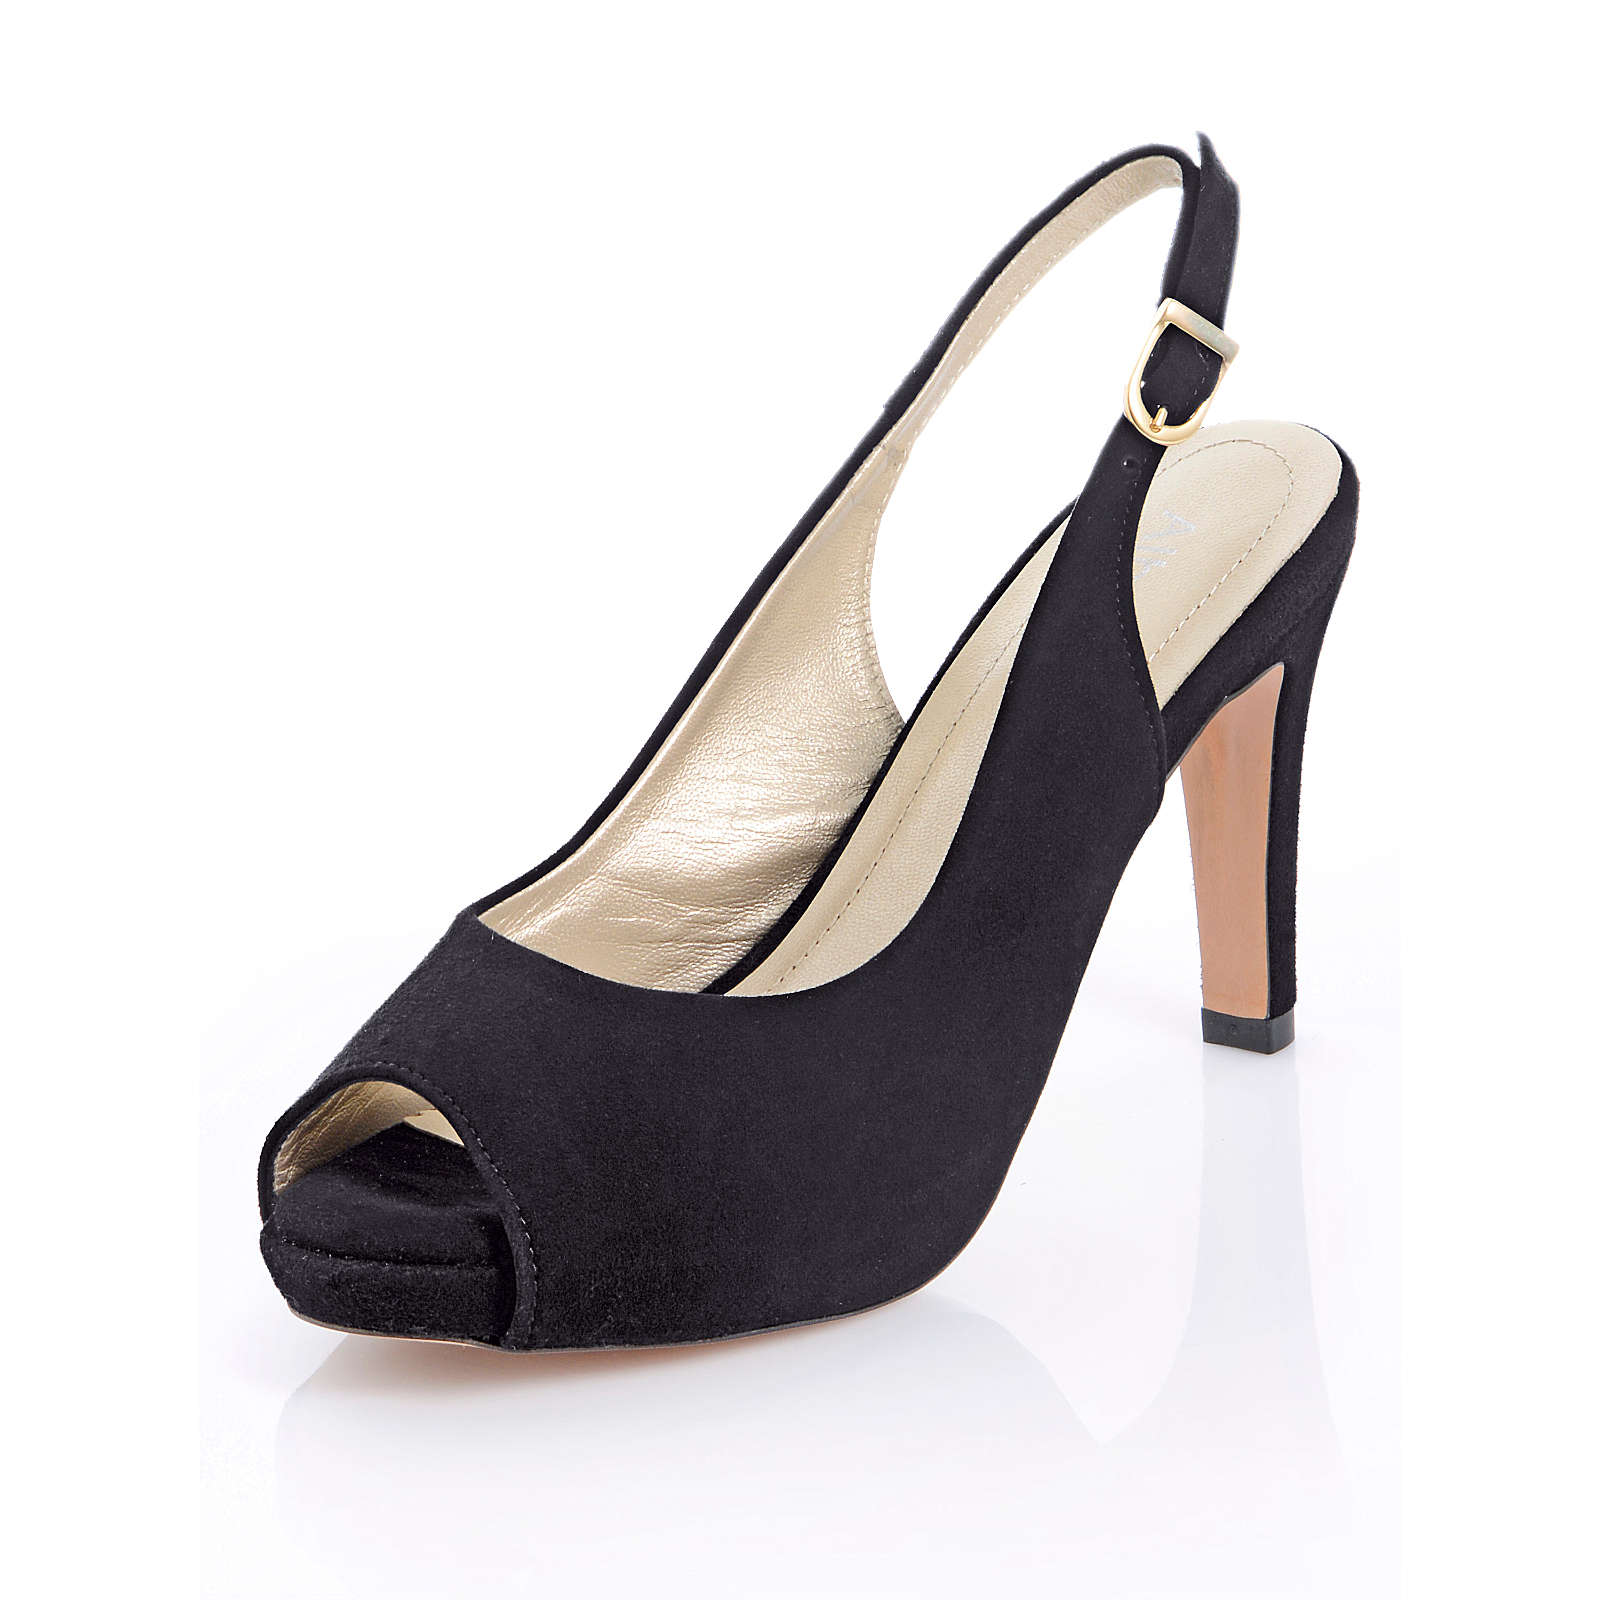 Alba Moda Sandalette schwarz Damen Gr. 40